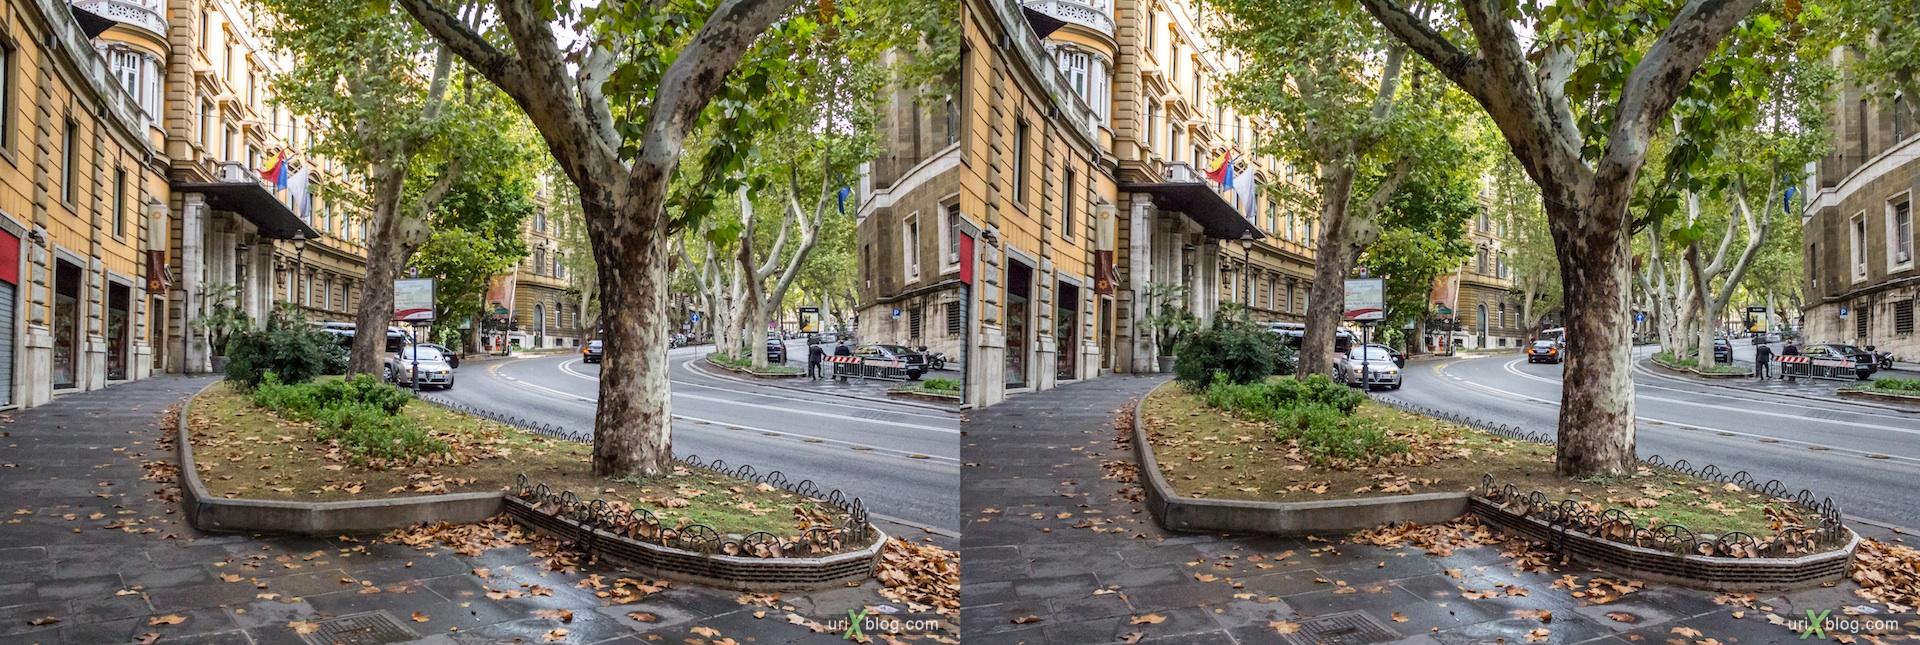 2012, улица Via Vittorio Veneto, Рим, Италия, осень, 3D, перекрёстные стереопары, стерео, стереопара, стереопары